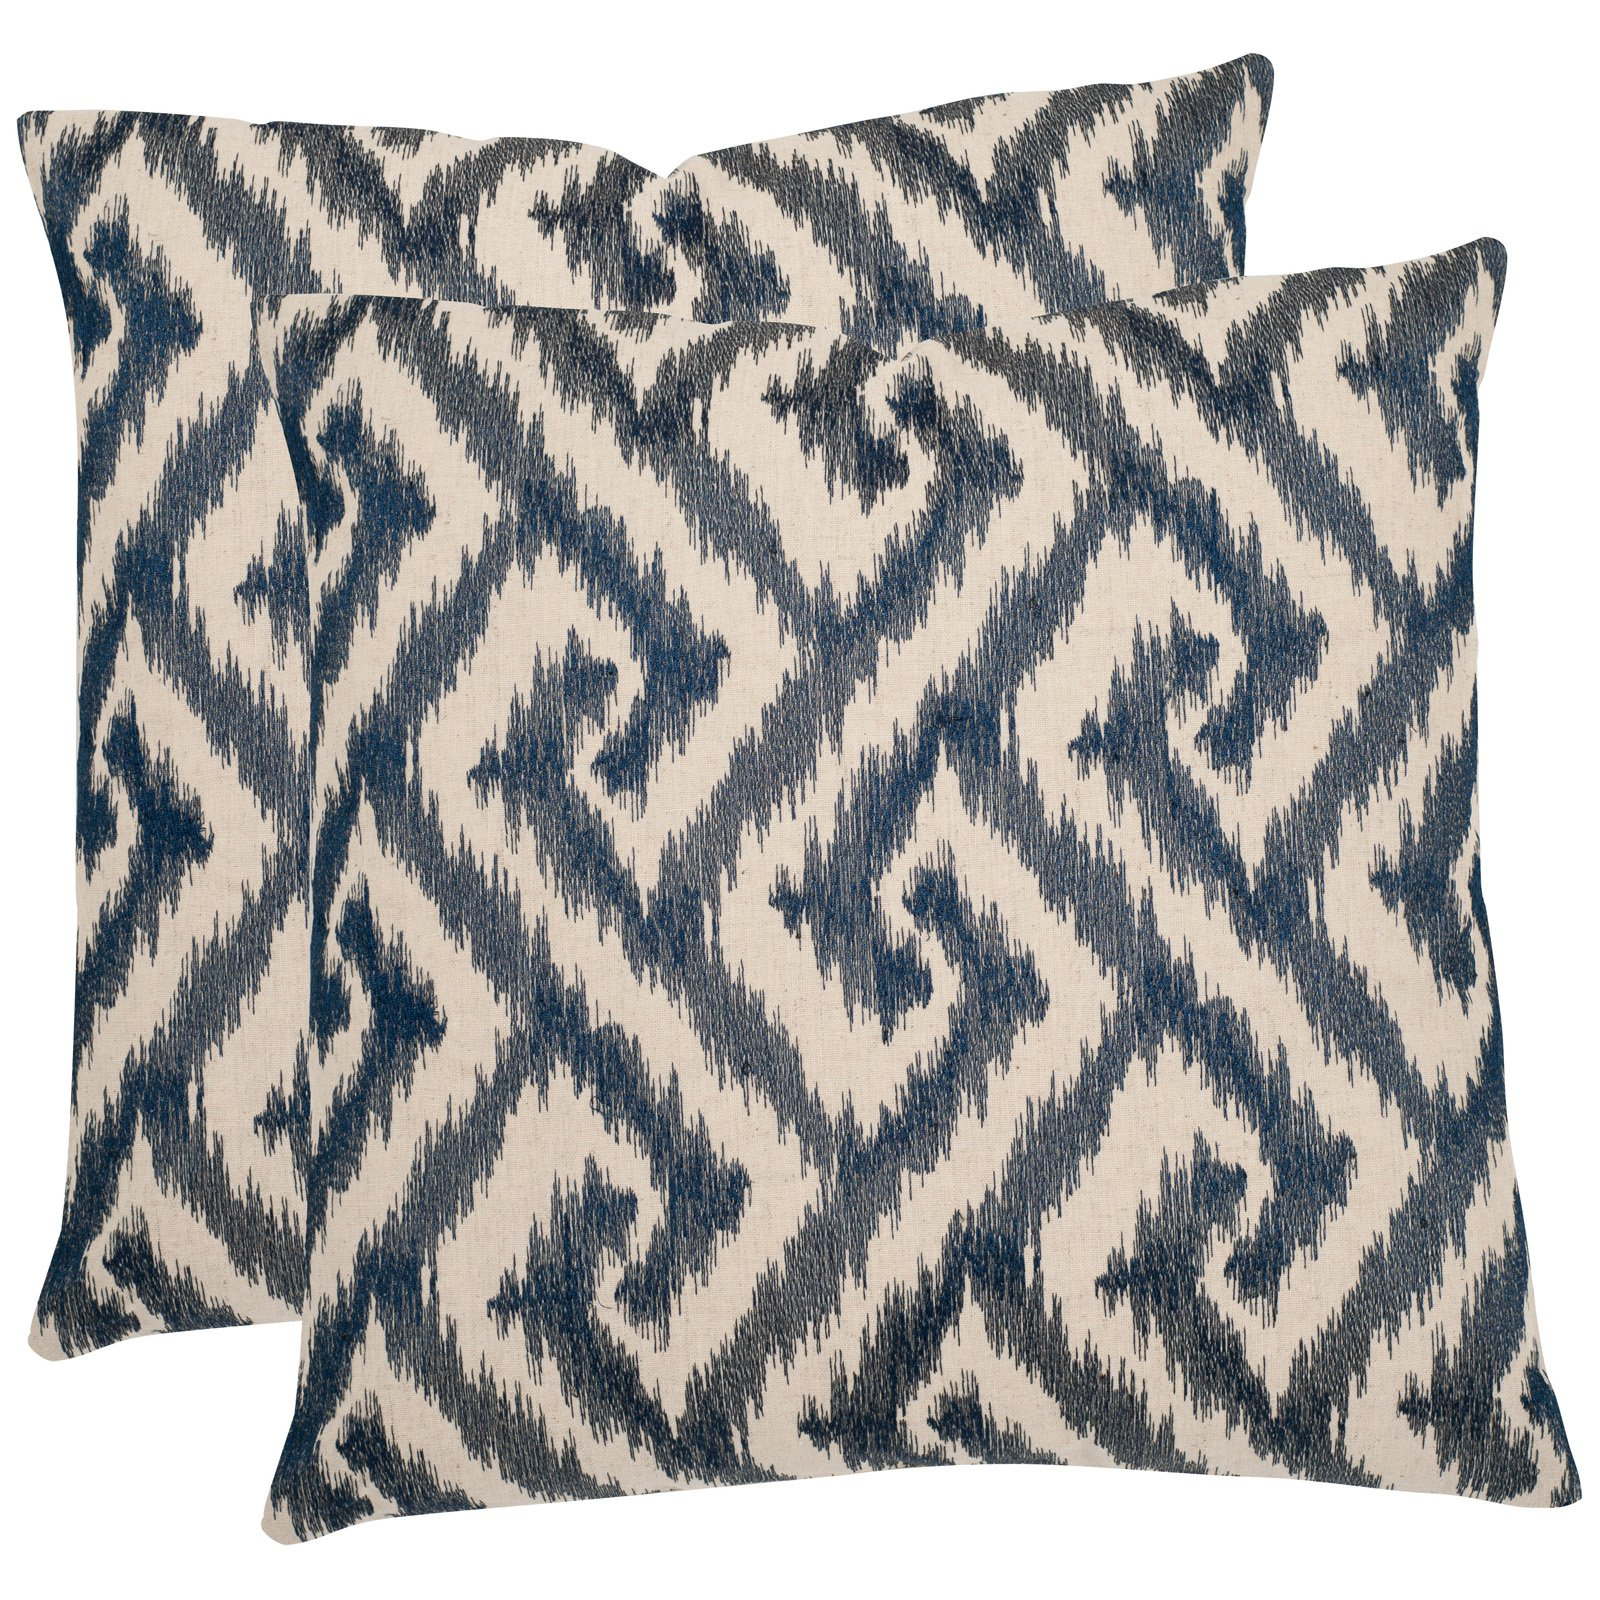 Safavieh Teddy Decorative Pillows - Set of 2